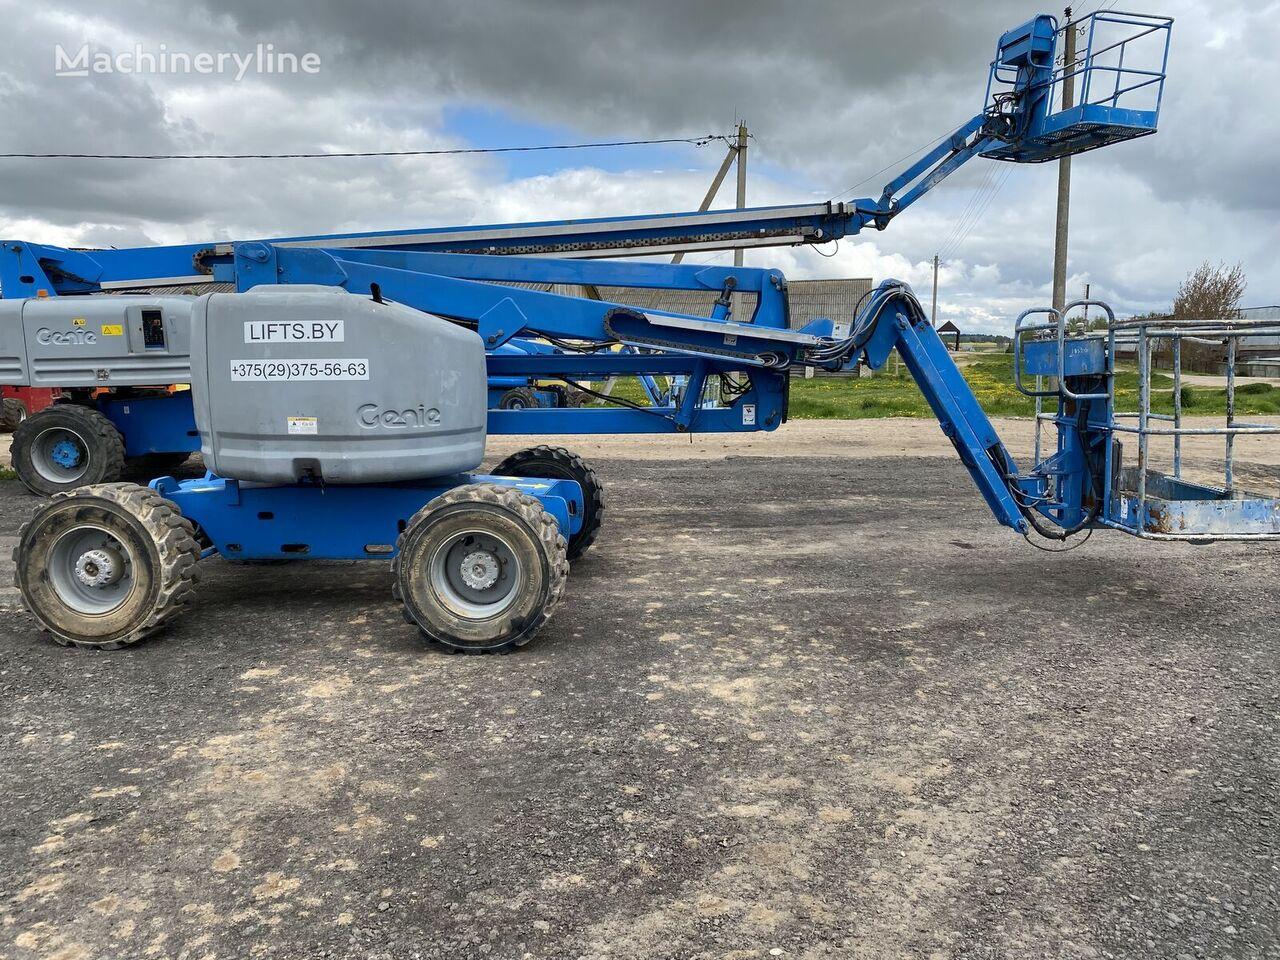 GENIE Z45/25 articulated boom lift